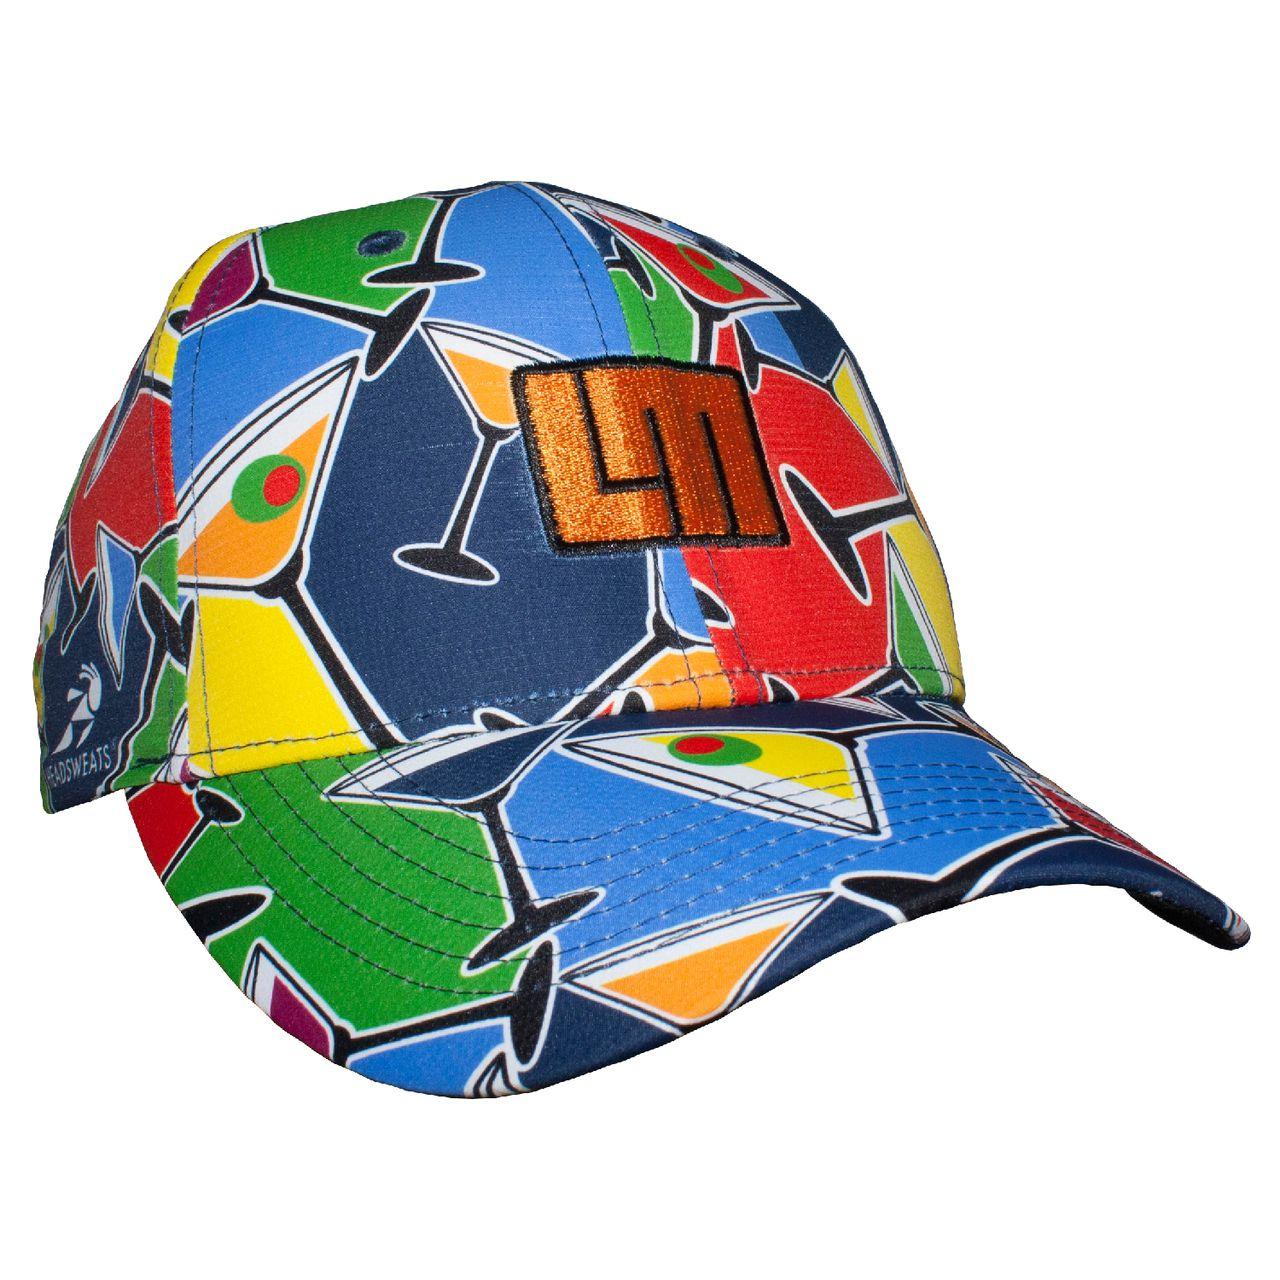 LOUDMOUTH 英國高爾夫服飾品牌-彩色雞尾酒休閒運動帽